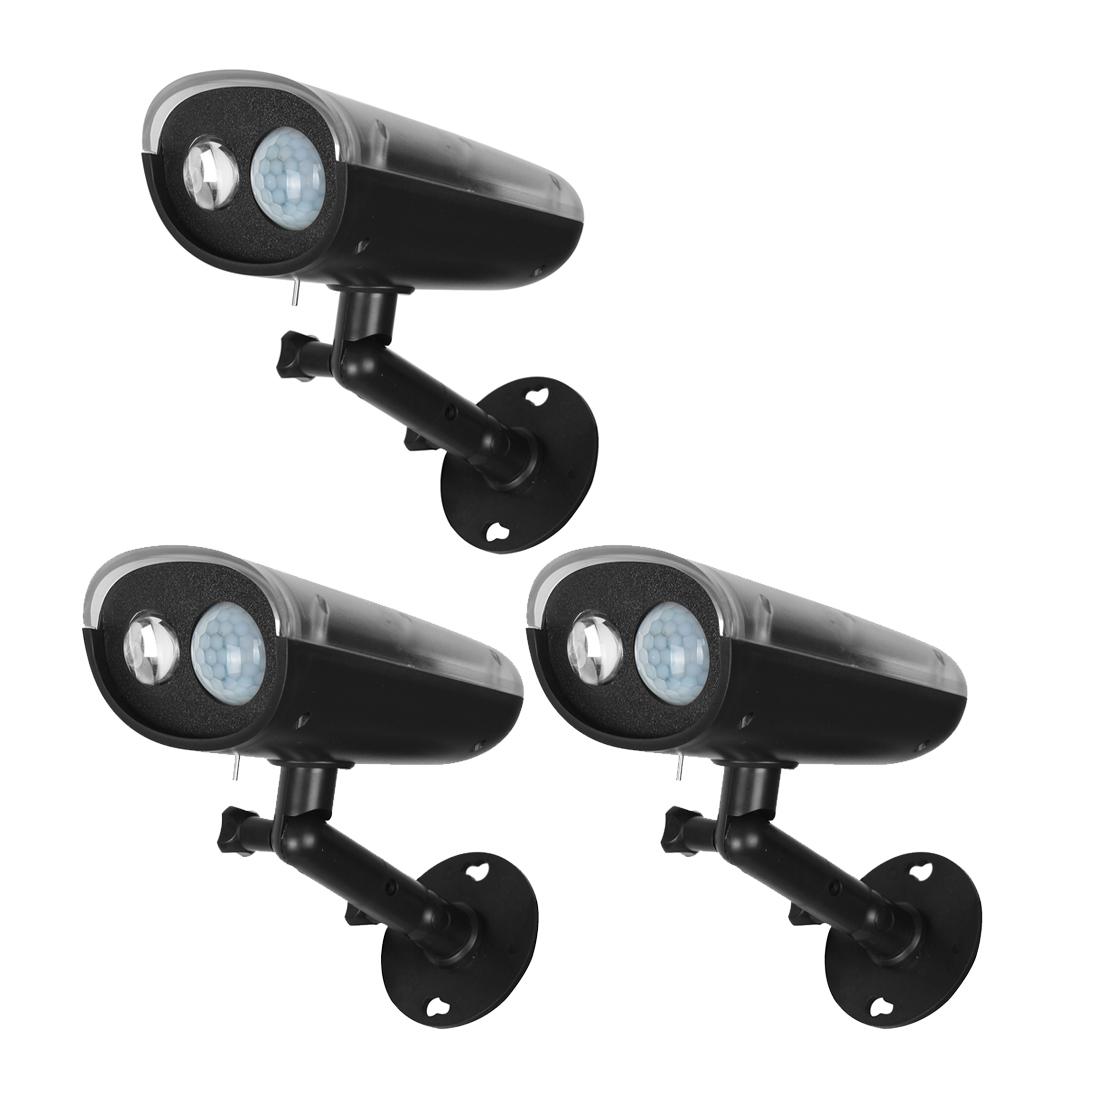 3 Pcs 3W Wireless Solar Motion Detect LED light Torch Outdoor Garden Lamp Waterproof IP66